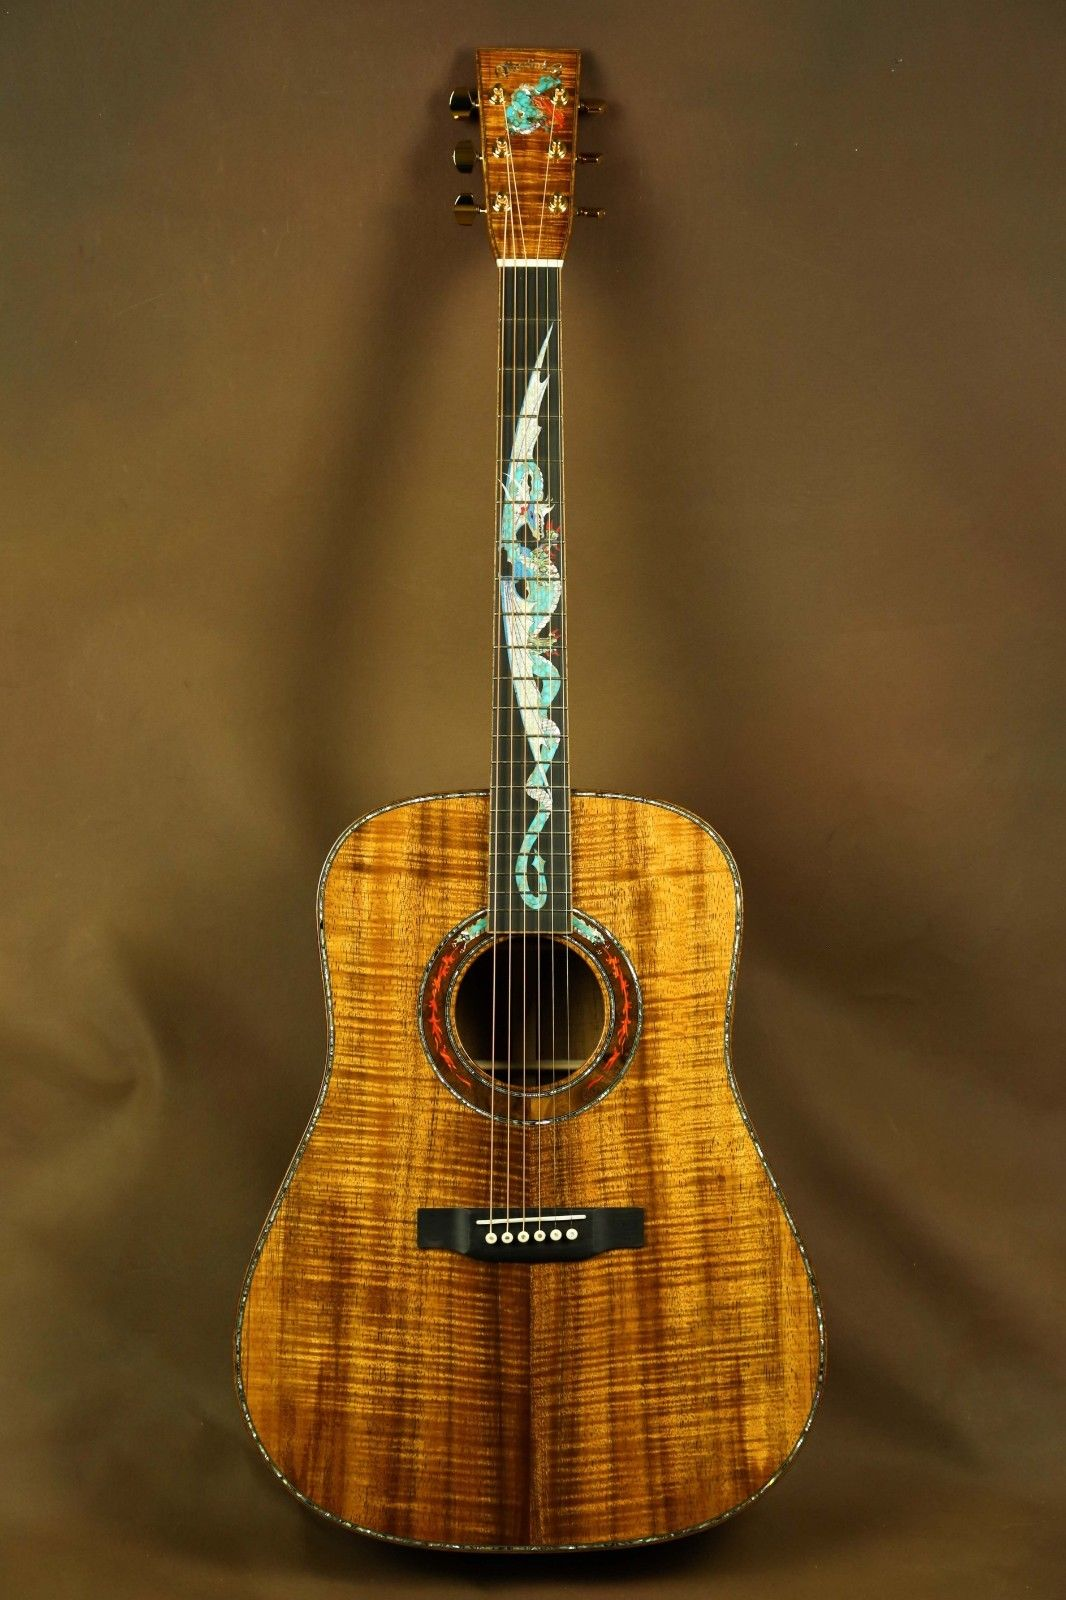 Martin Dragon Custom Dreadnought Highly Figured Koa Acoustic Guitar D 41 D 45 Ebay Violao Voce Me Completa Cursos